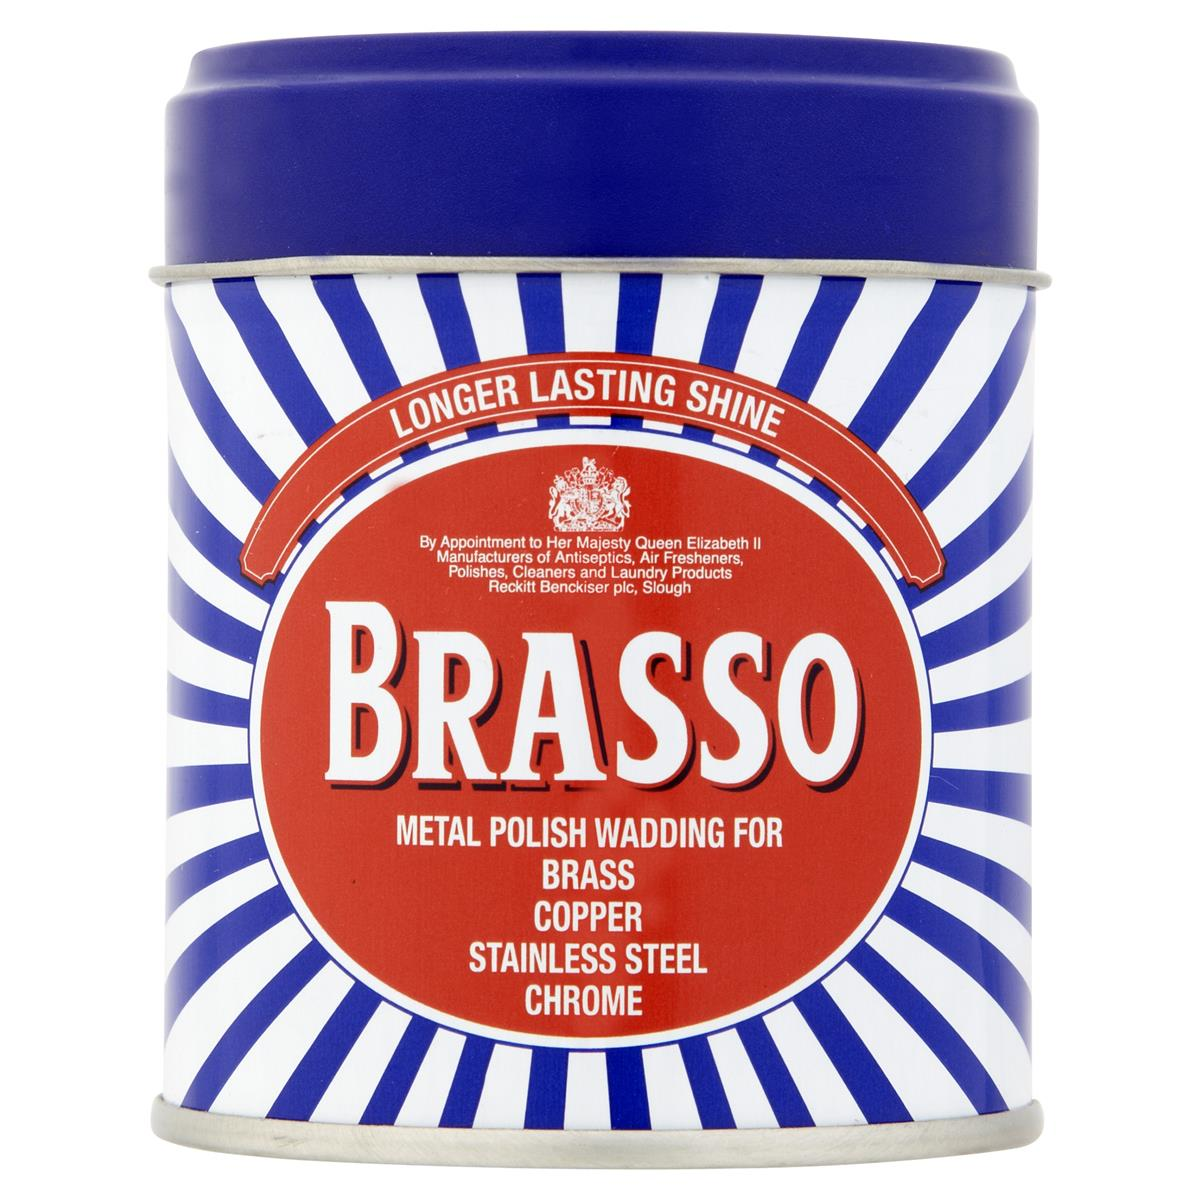 Brasso Metal Polish Wadding 75g Ref 125758